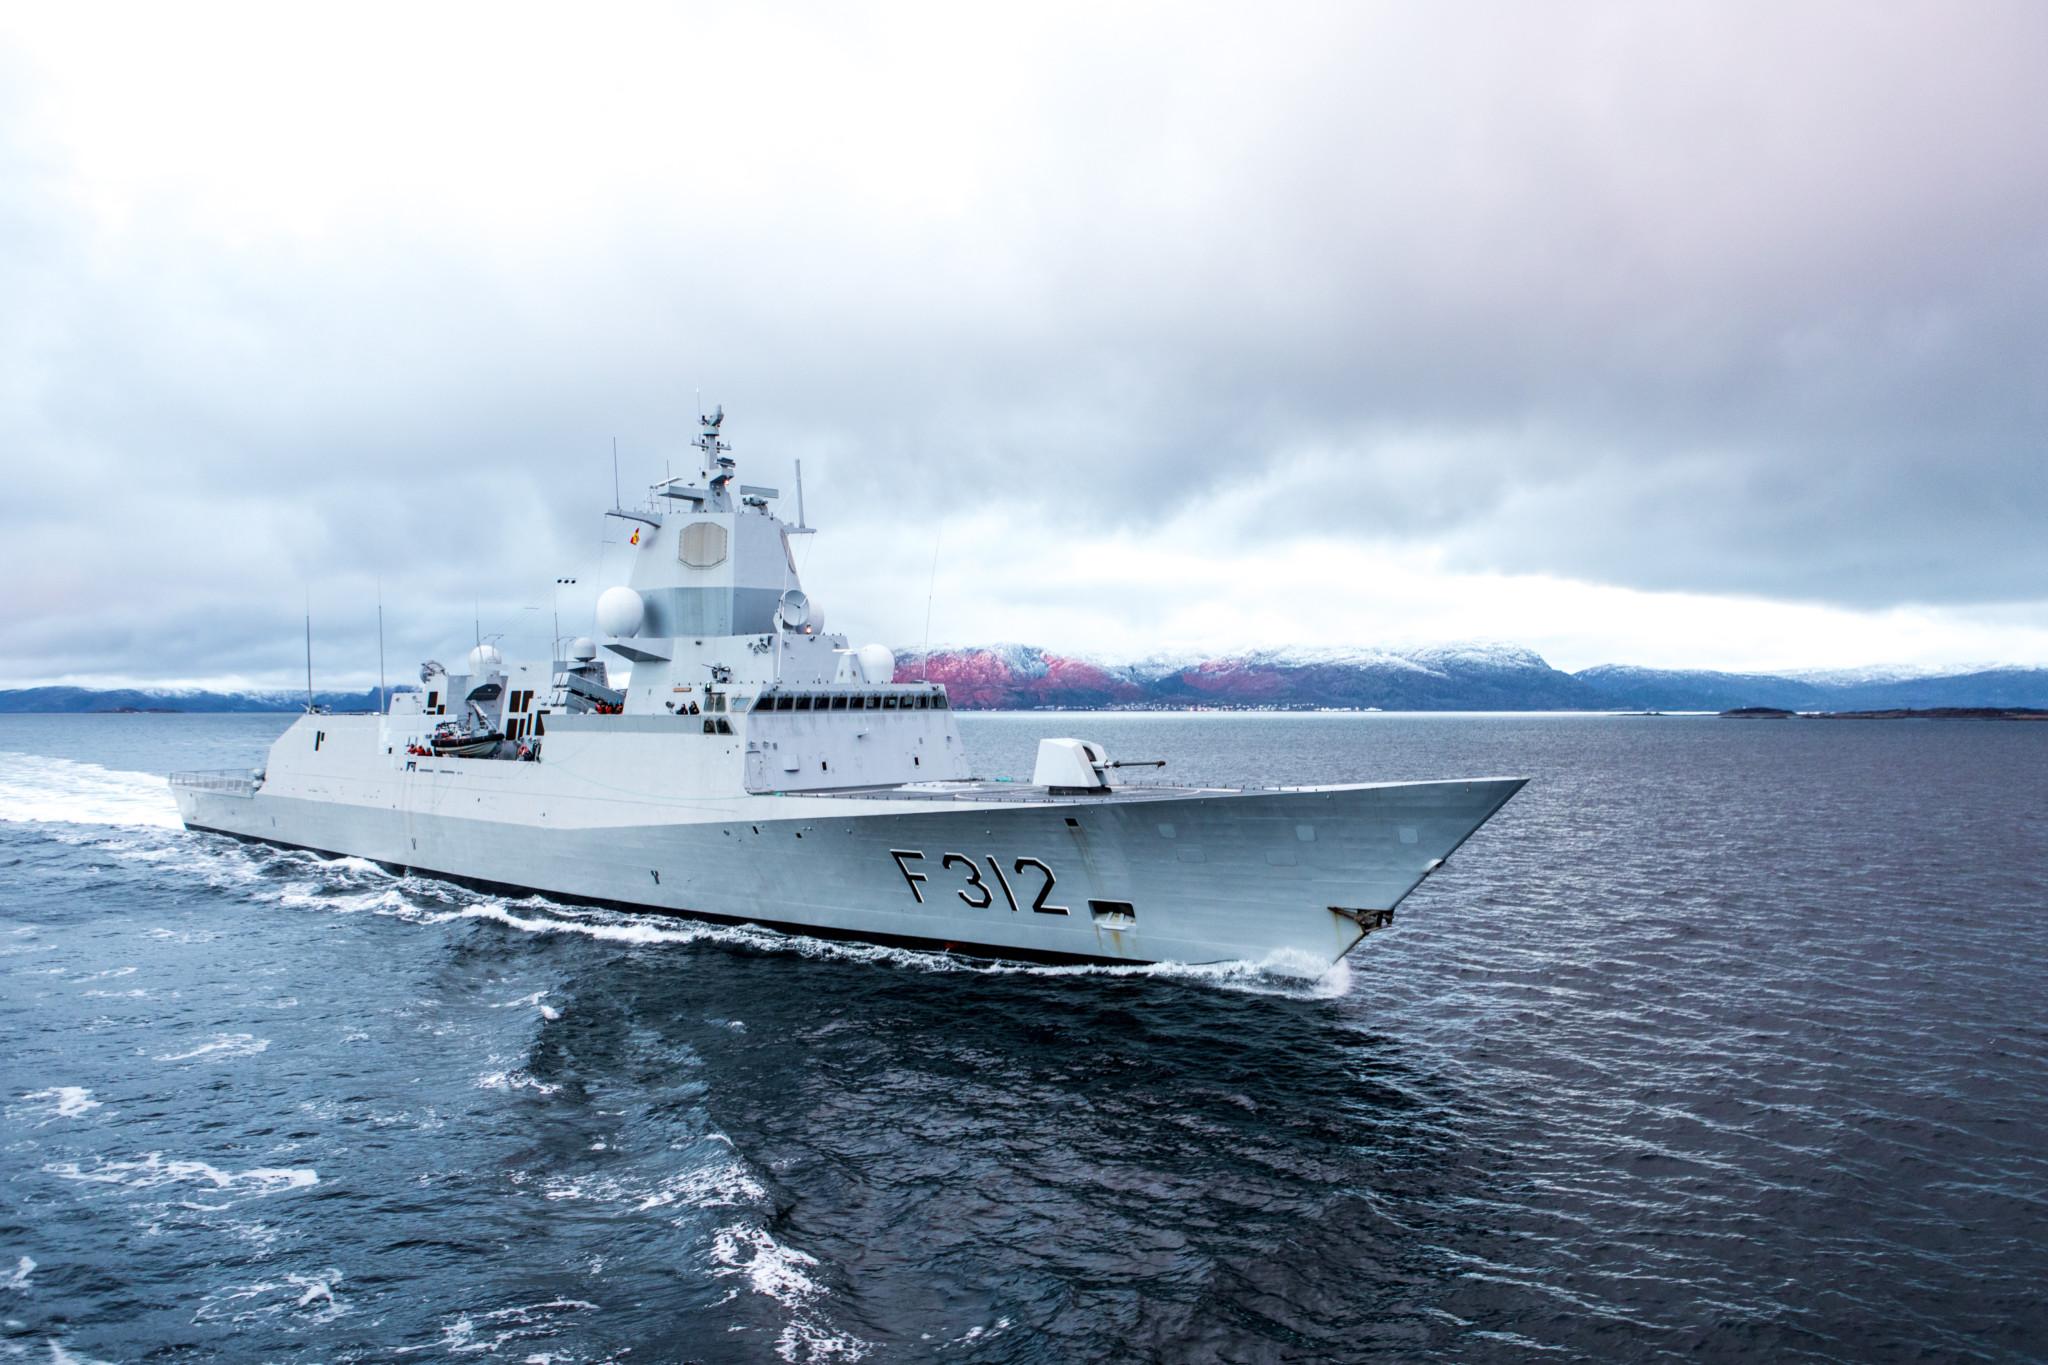 Krigføring under vann på NATOs dagsorden